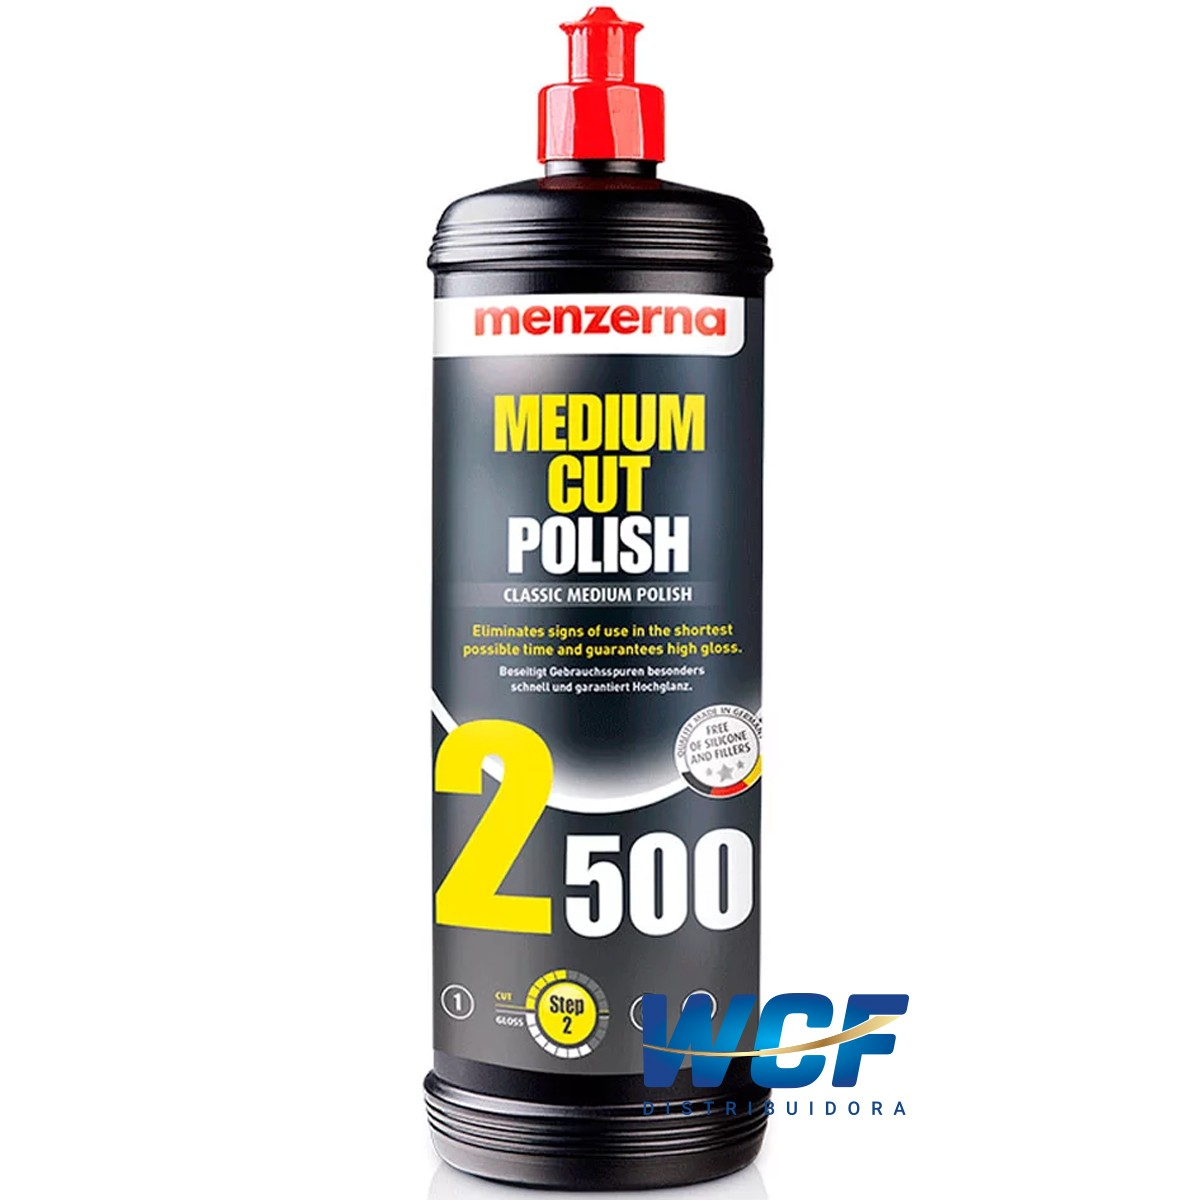 MEDIUM CUT POLISH MEDIO 2500 1LT MENZERNA